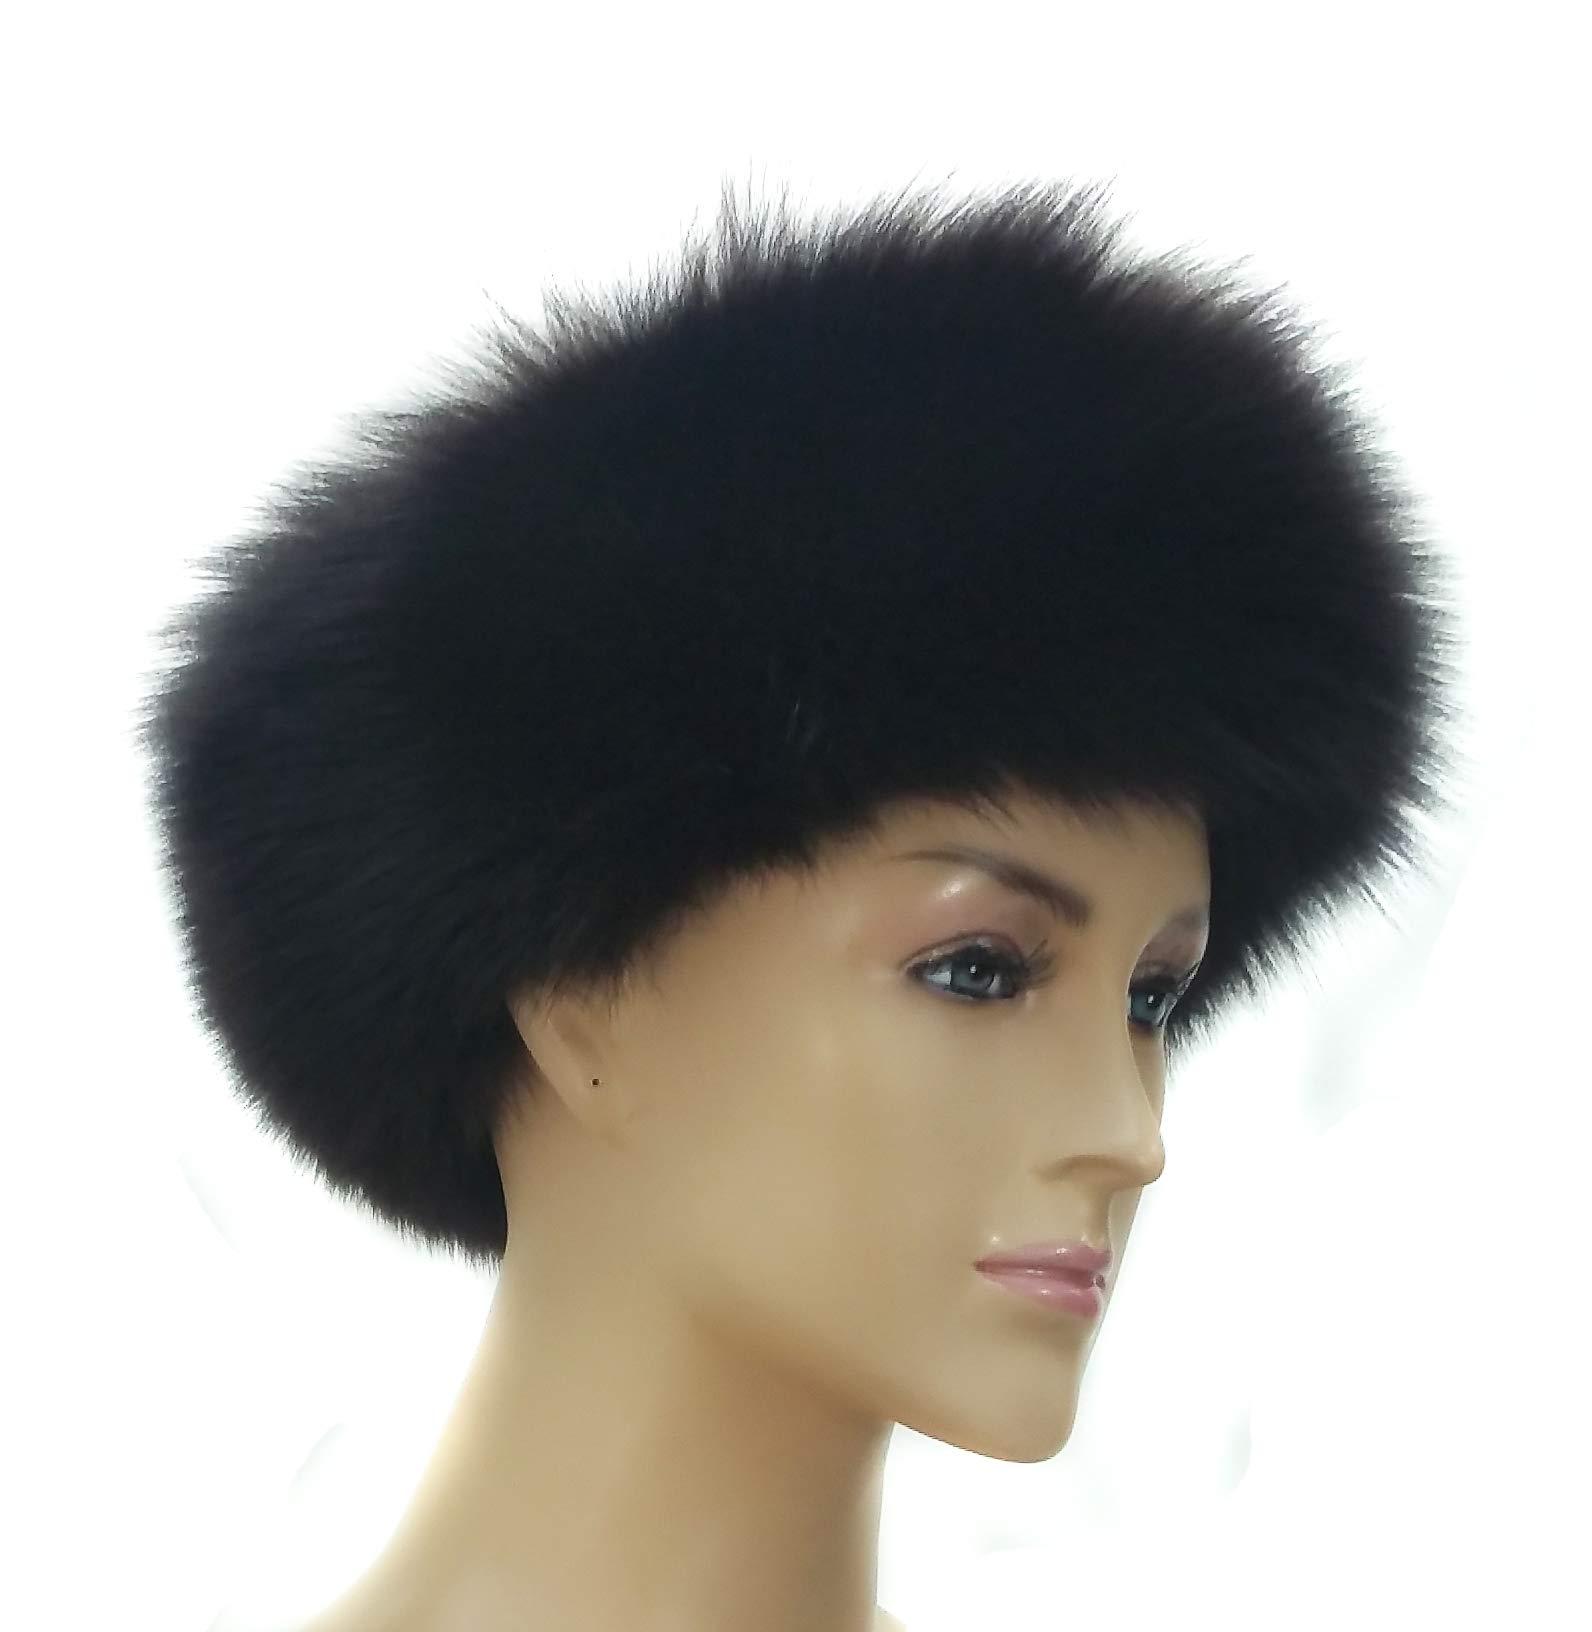 Fox Fur Headband Black by Hima (Image #1)